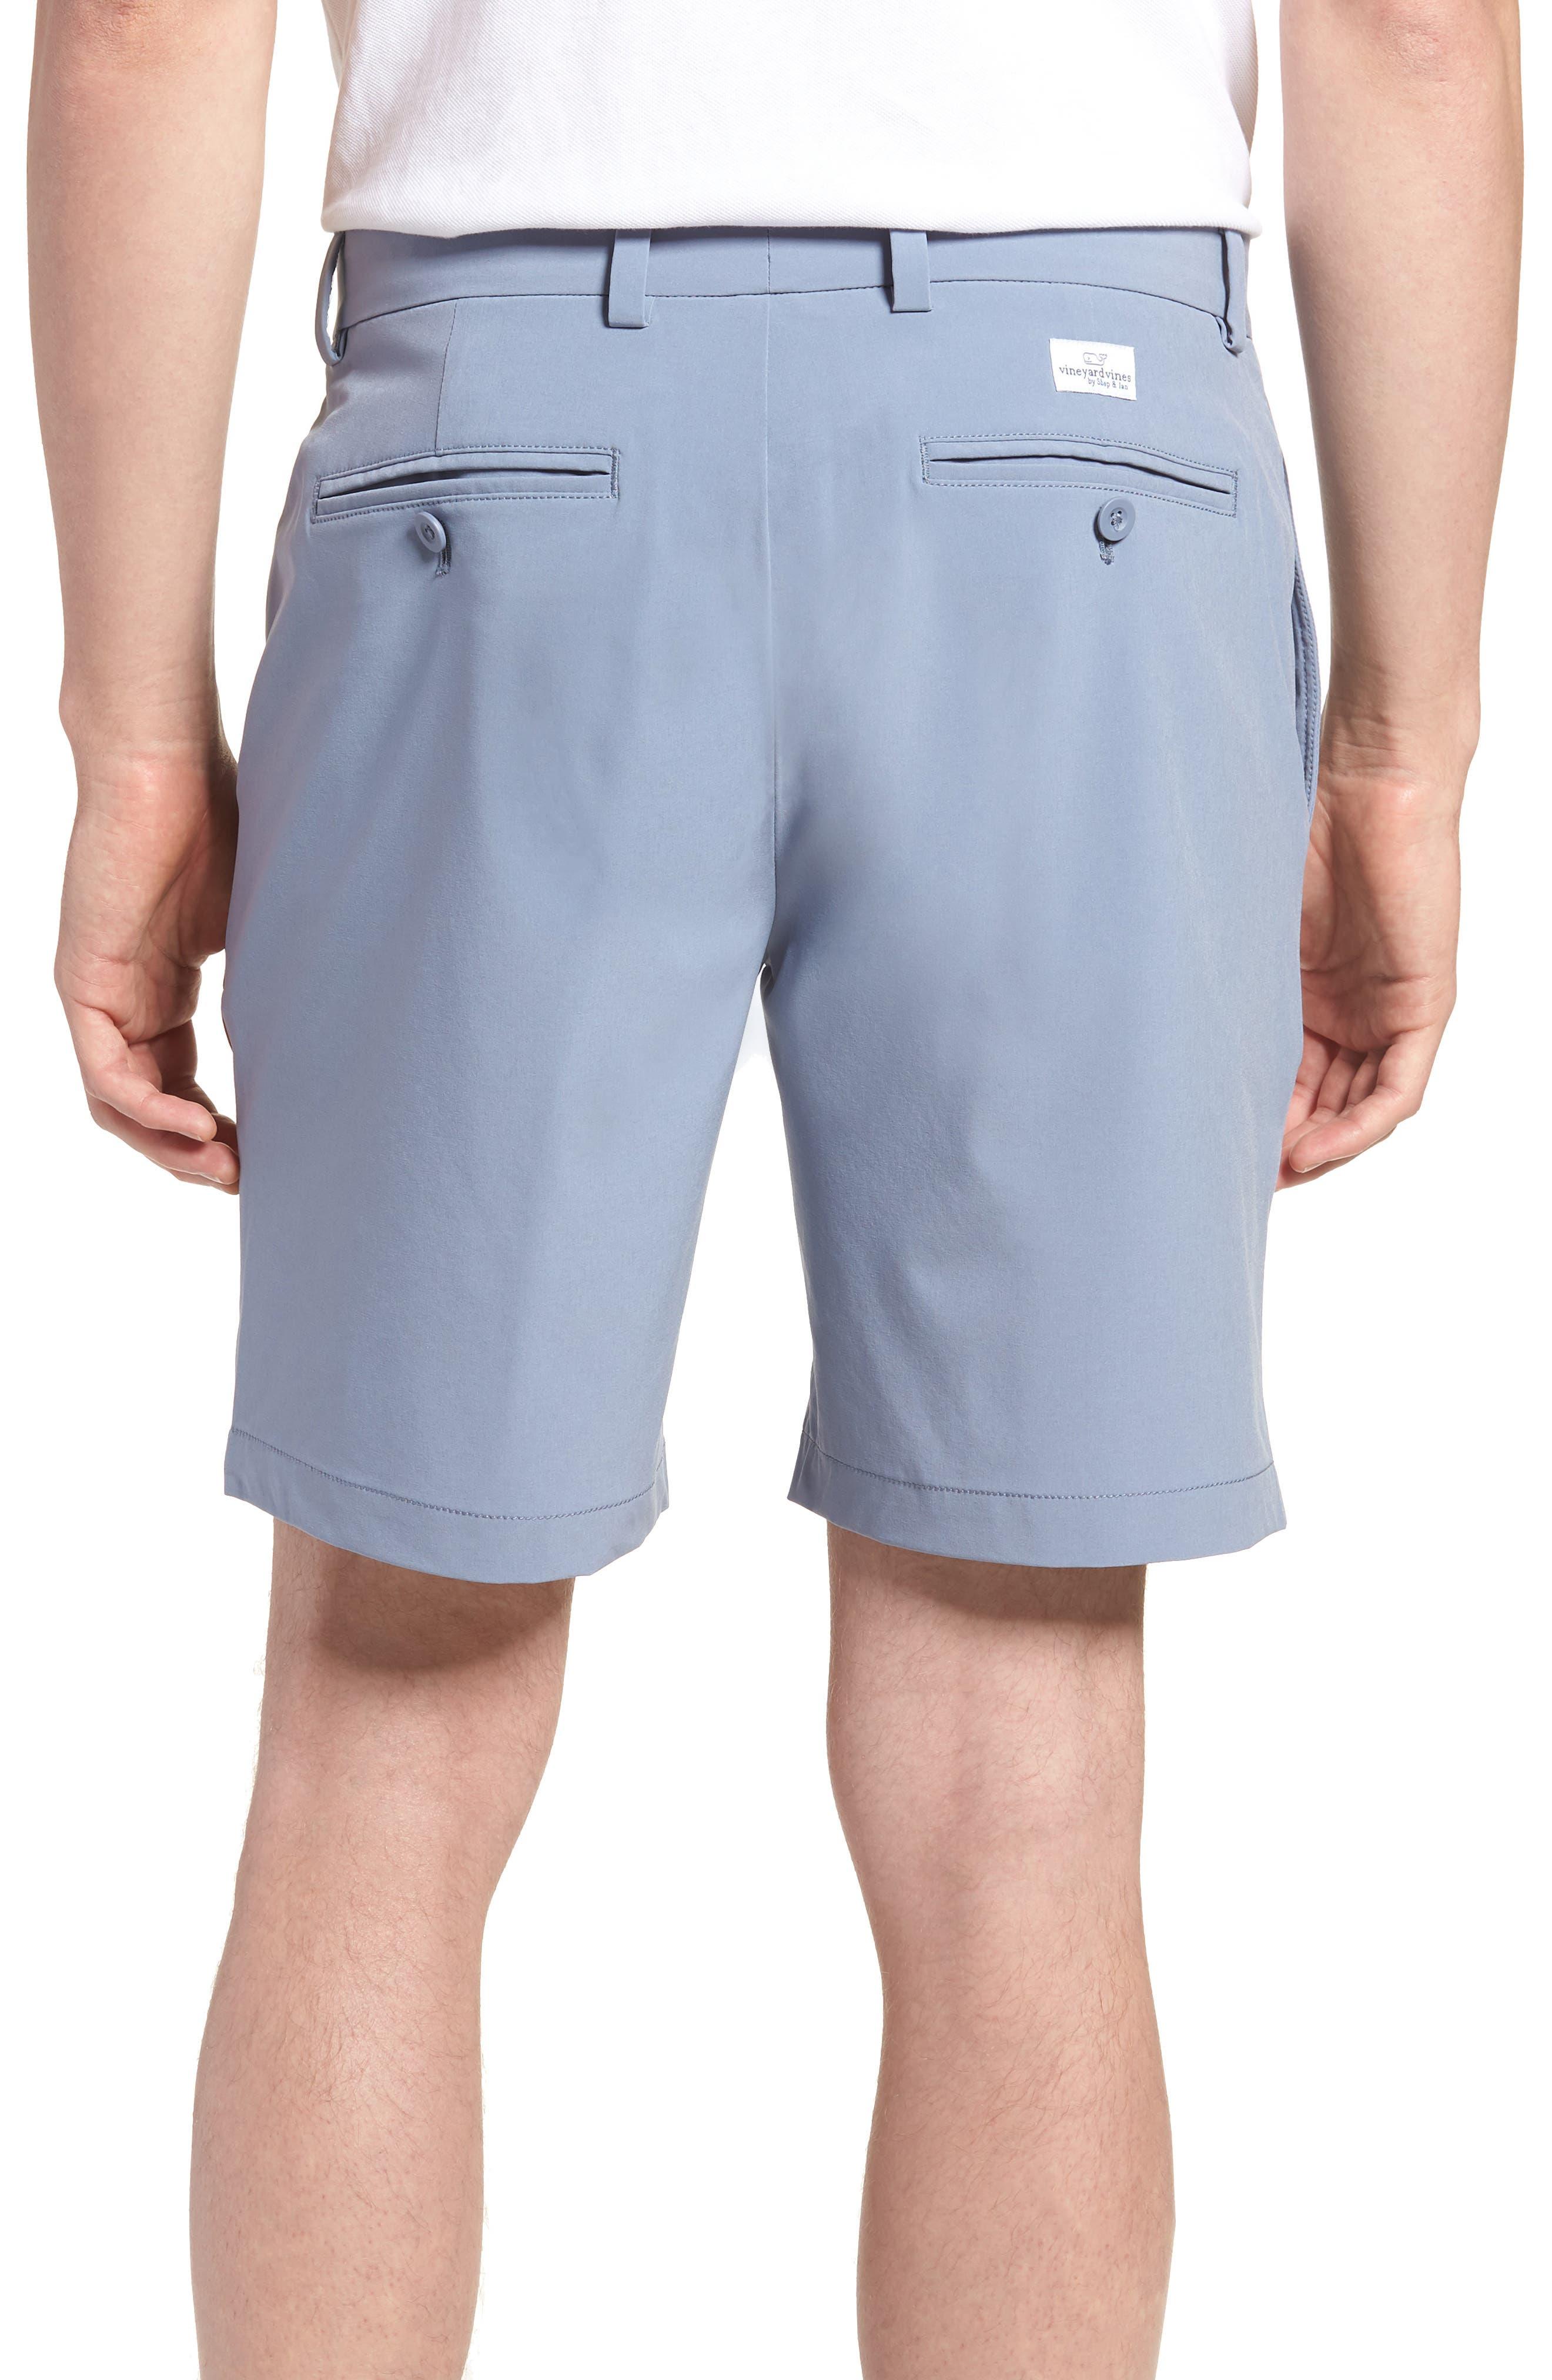 8 Inch Performance Breaker Shorts,                             Alternate thumbnail 2, color,                             423